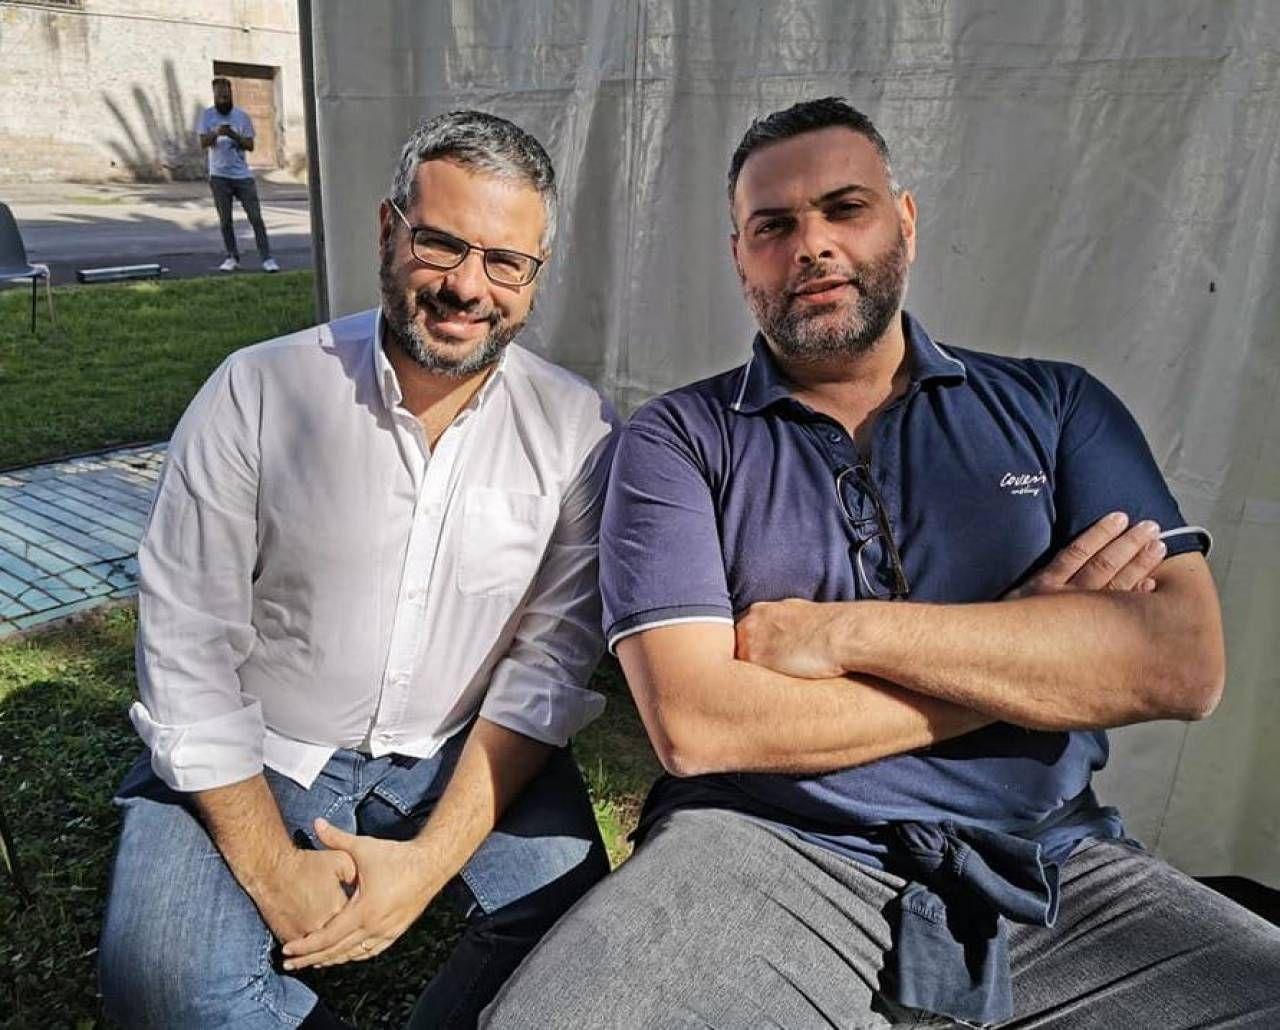 Luca Migliorino e Giacomo Giannarelli